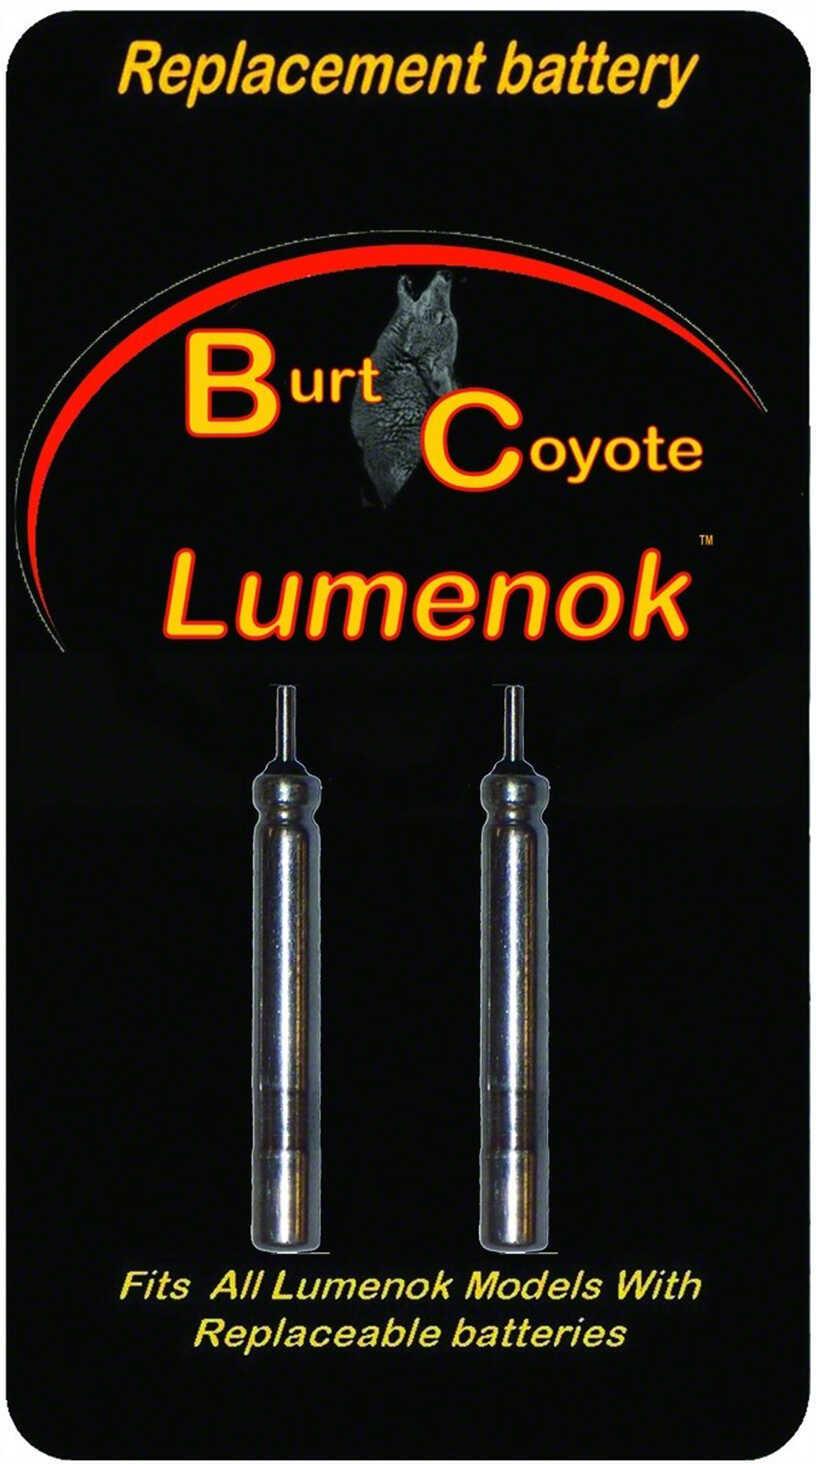 LUMENOK Replacement Battery For Lighted NOCK 2Pk